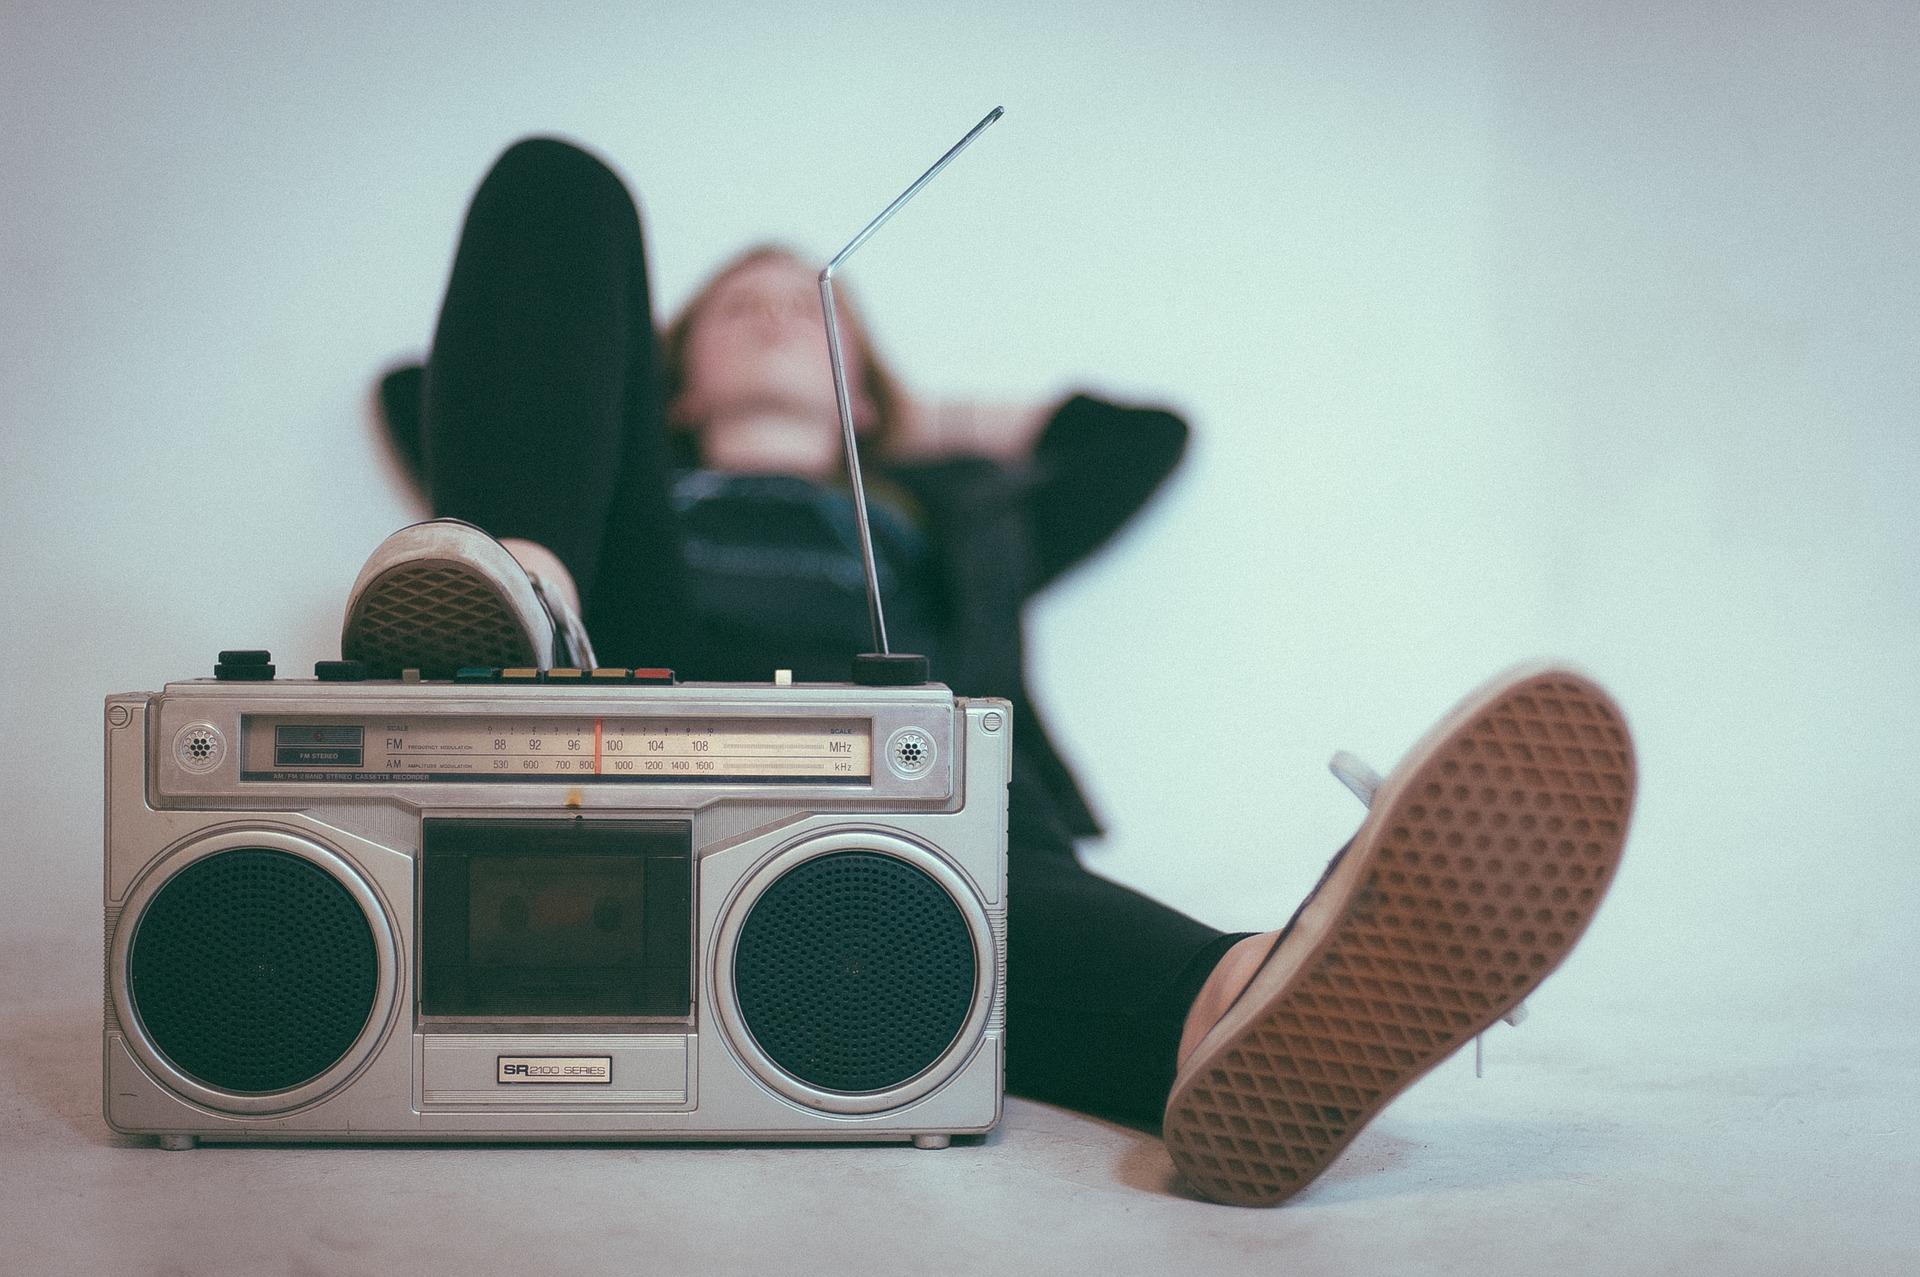 LINK TO MAJOR FM RADIO RELEASE